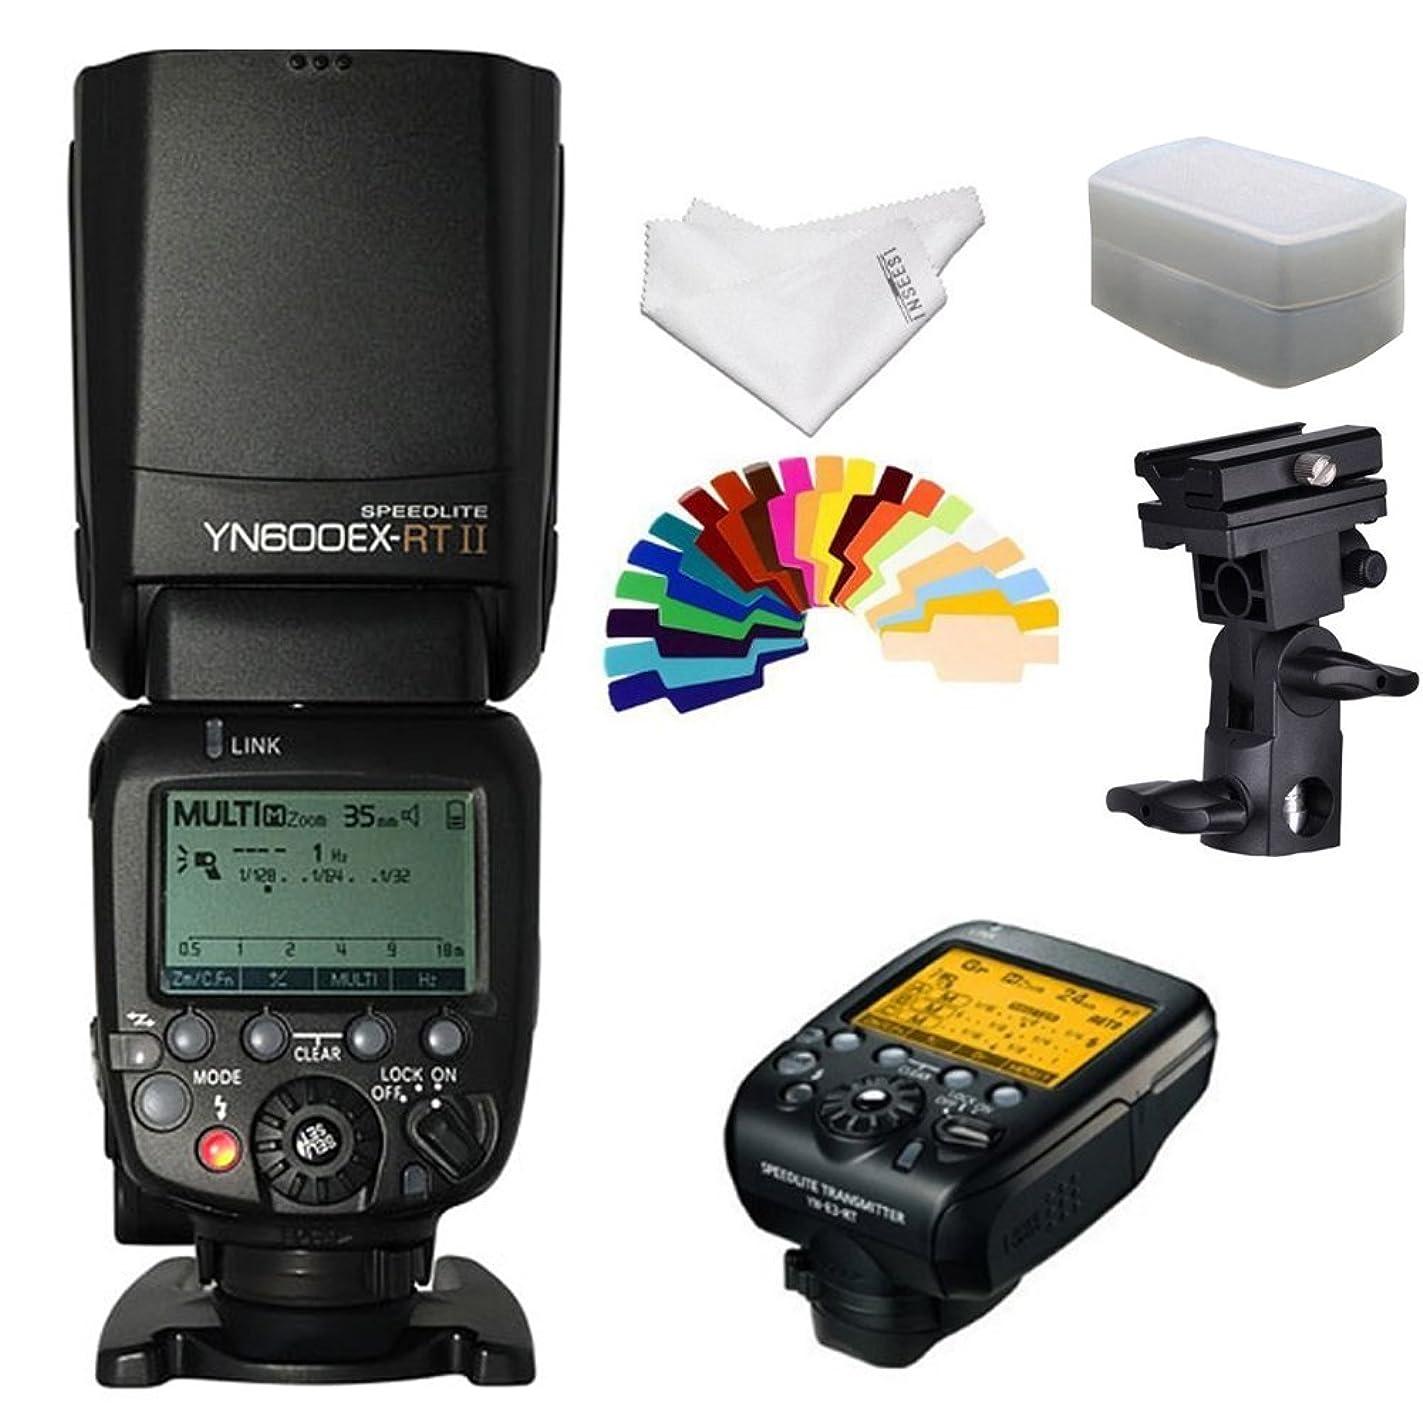 YONGNUO YN600EX-RT II Flash Speedlite +YNE3-RT Flash Controller for Canon Cameras +INSEESI Clean Cloth+Flash Diffuser+B Type Flash Swivel Bracket +20 Color Gels reu23119285